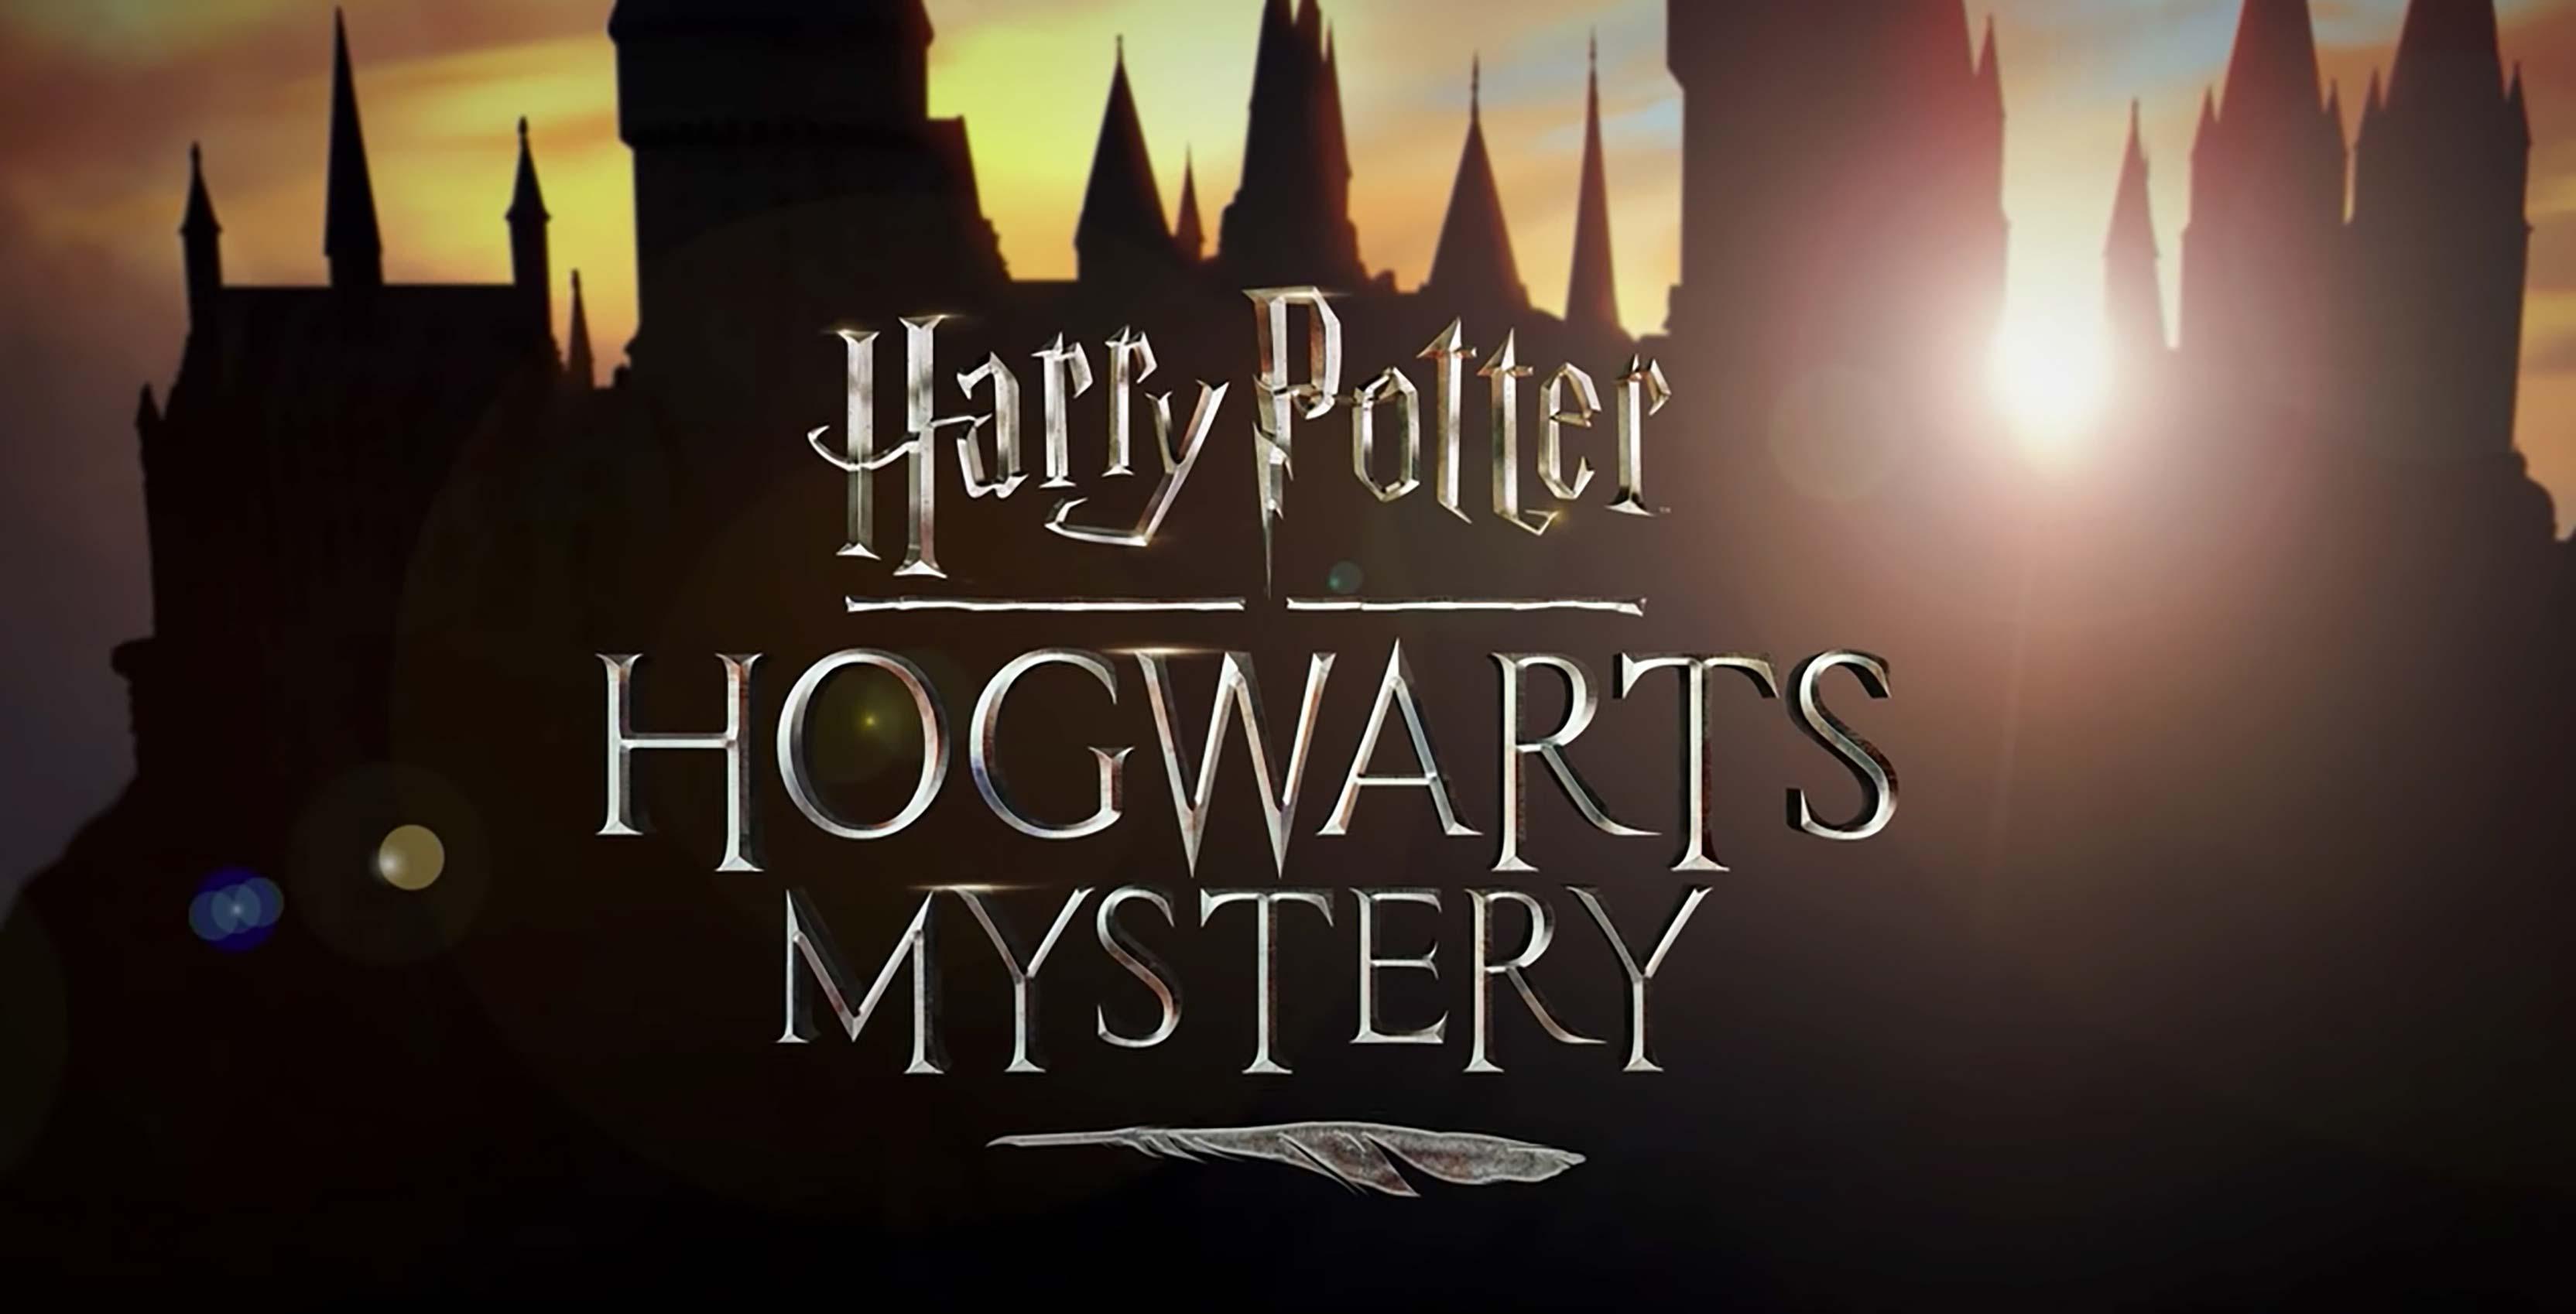 Harry Potter Hogwarts Mystery logo